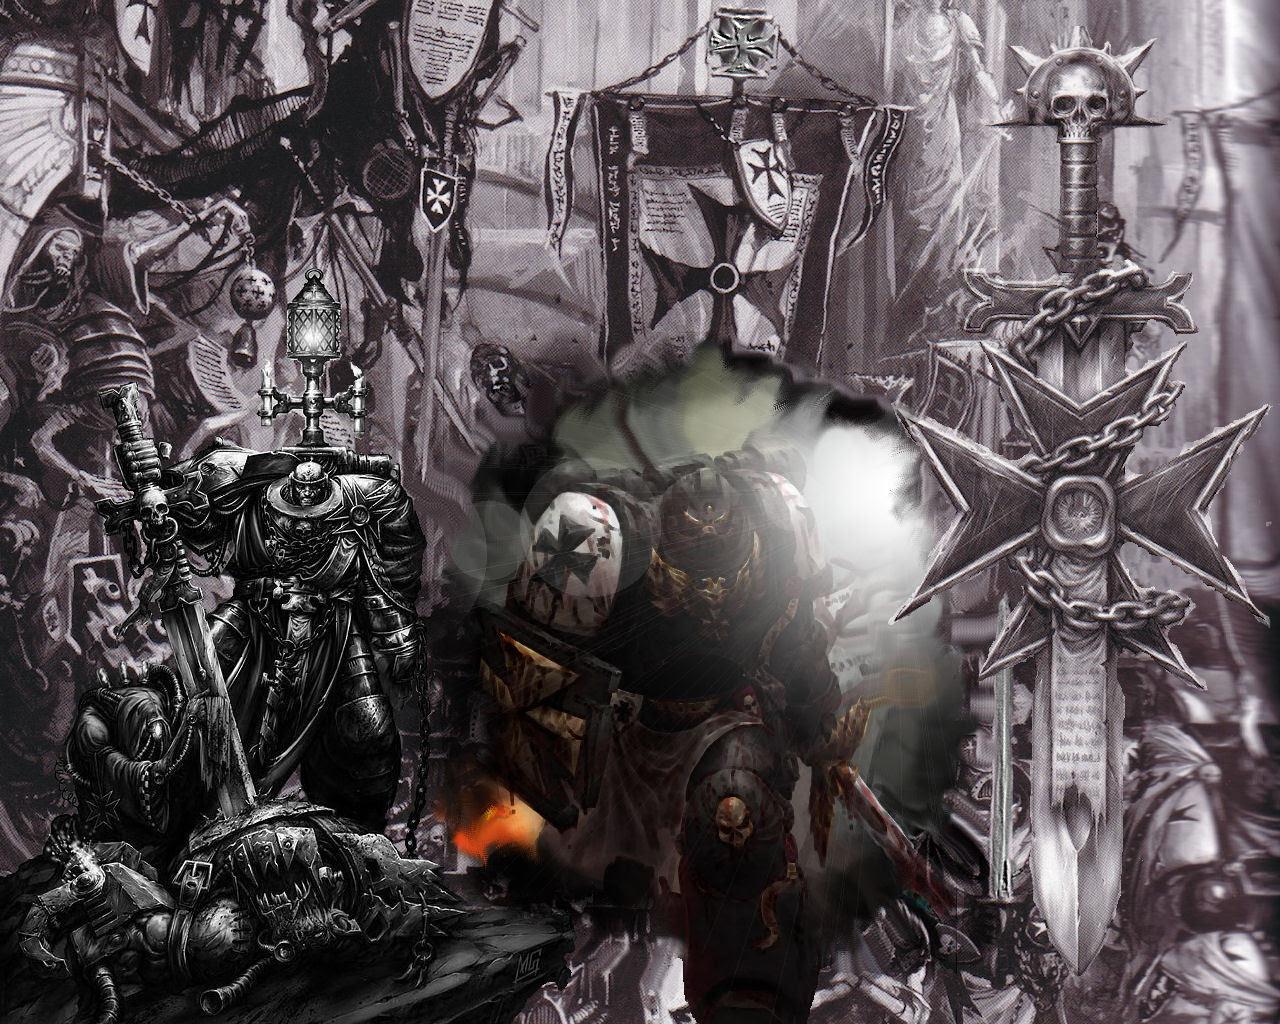 Black Templars Warhammer 40k Wallpaper 10228039 Fanpop